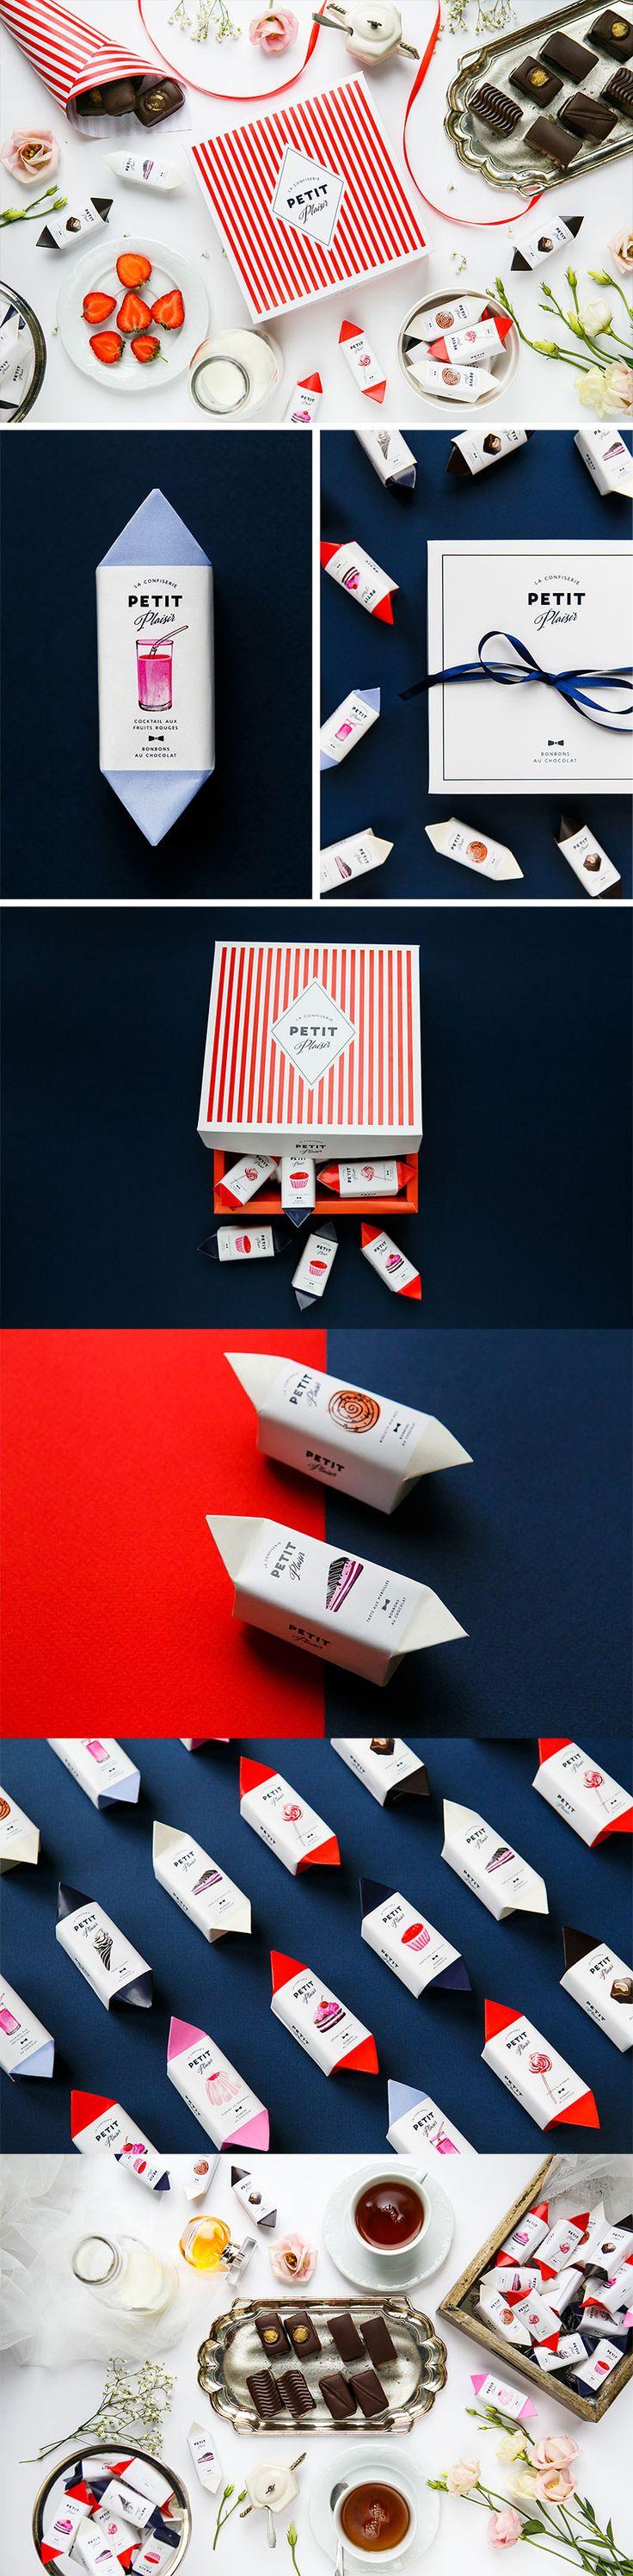 Petit plaisir Branding and Packaging